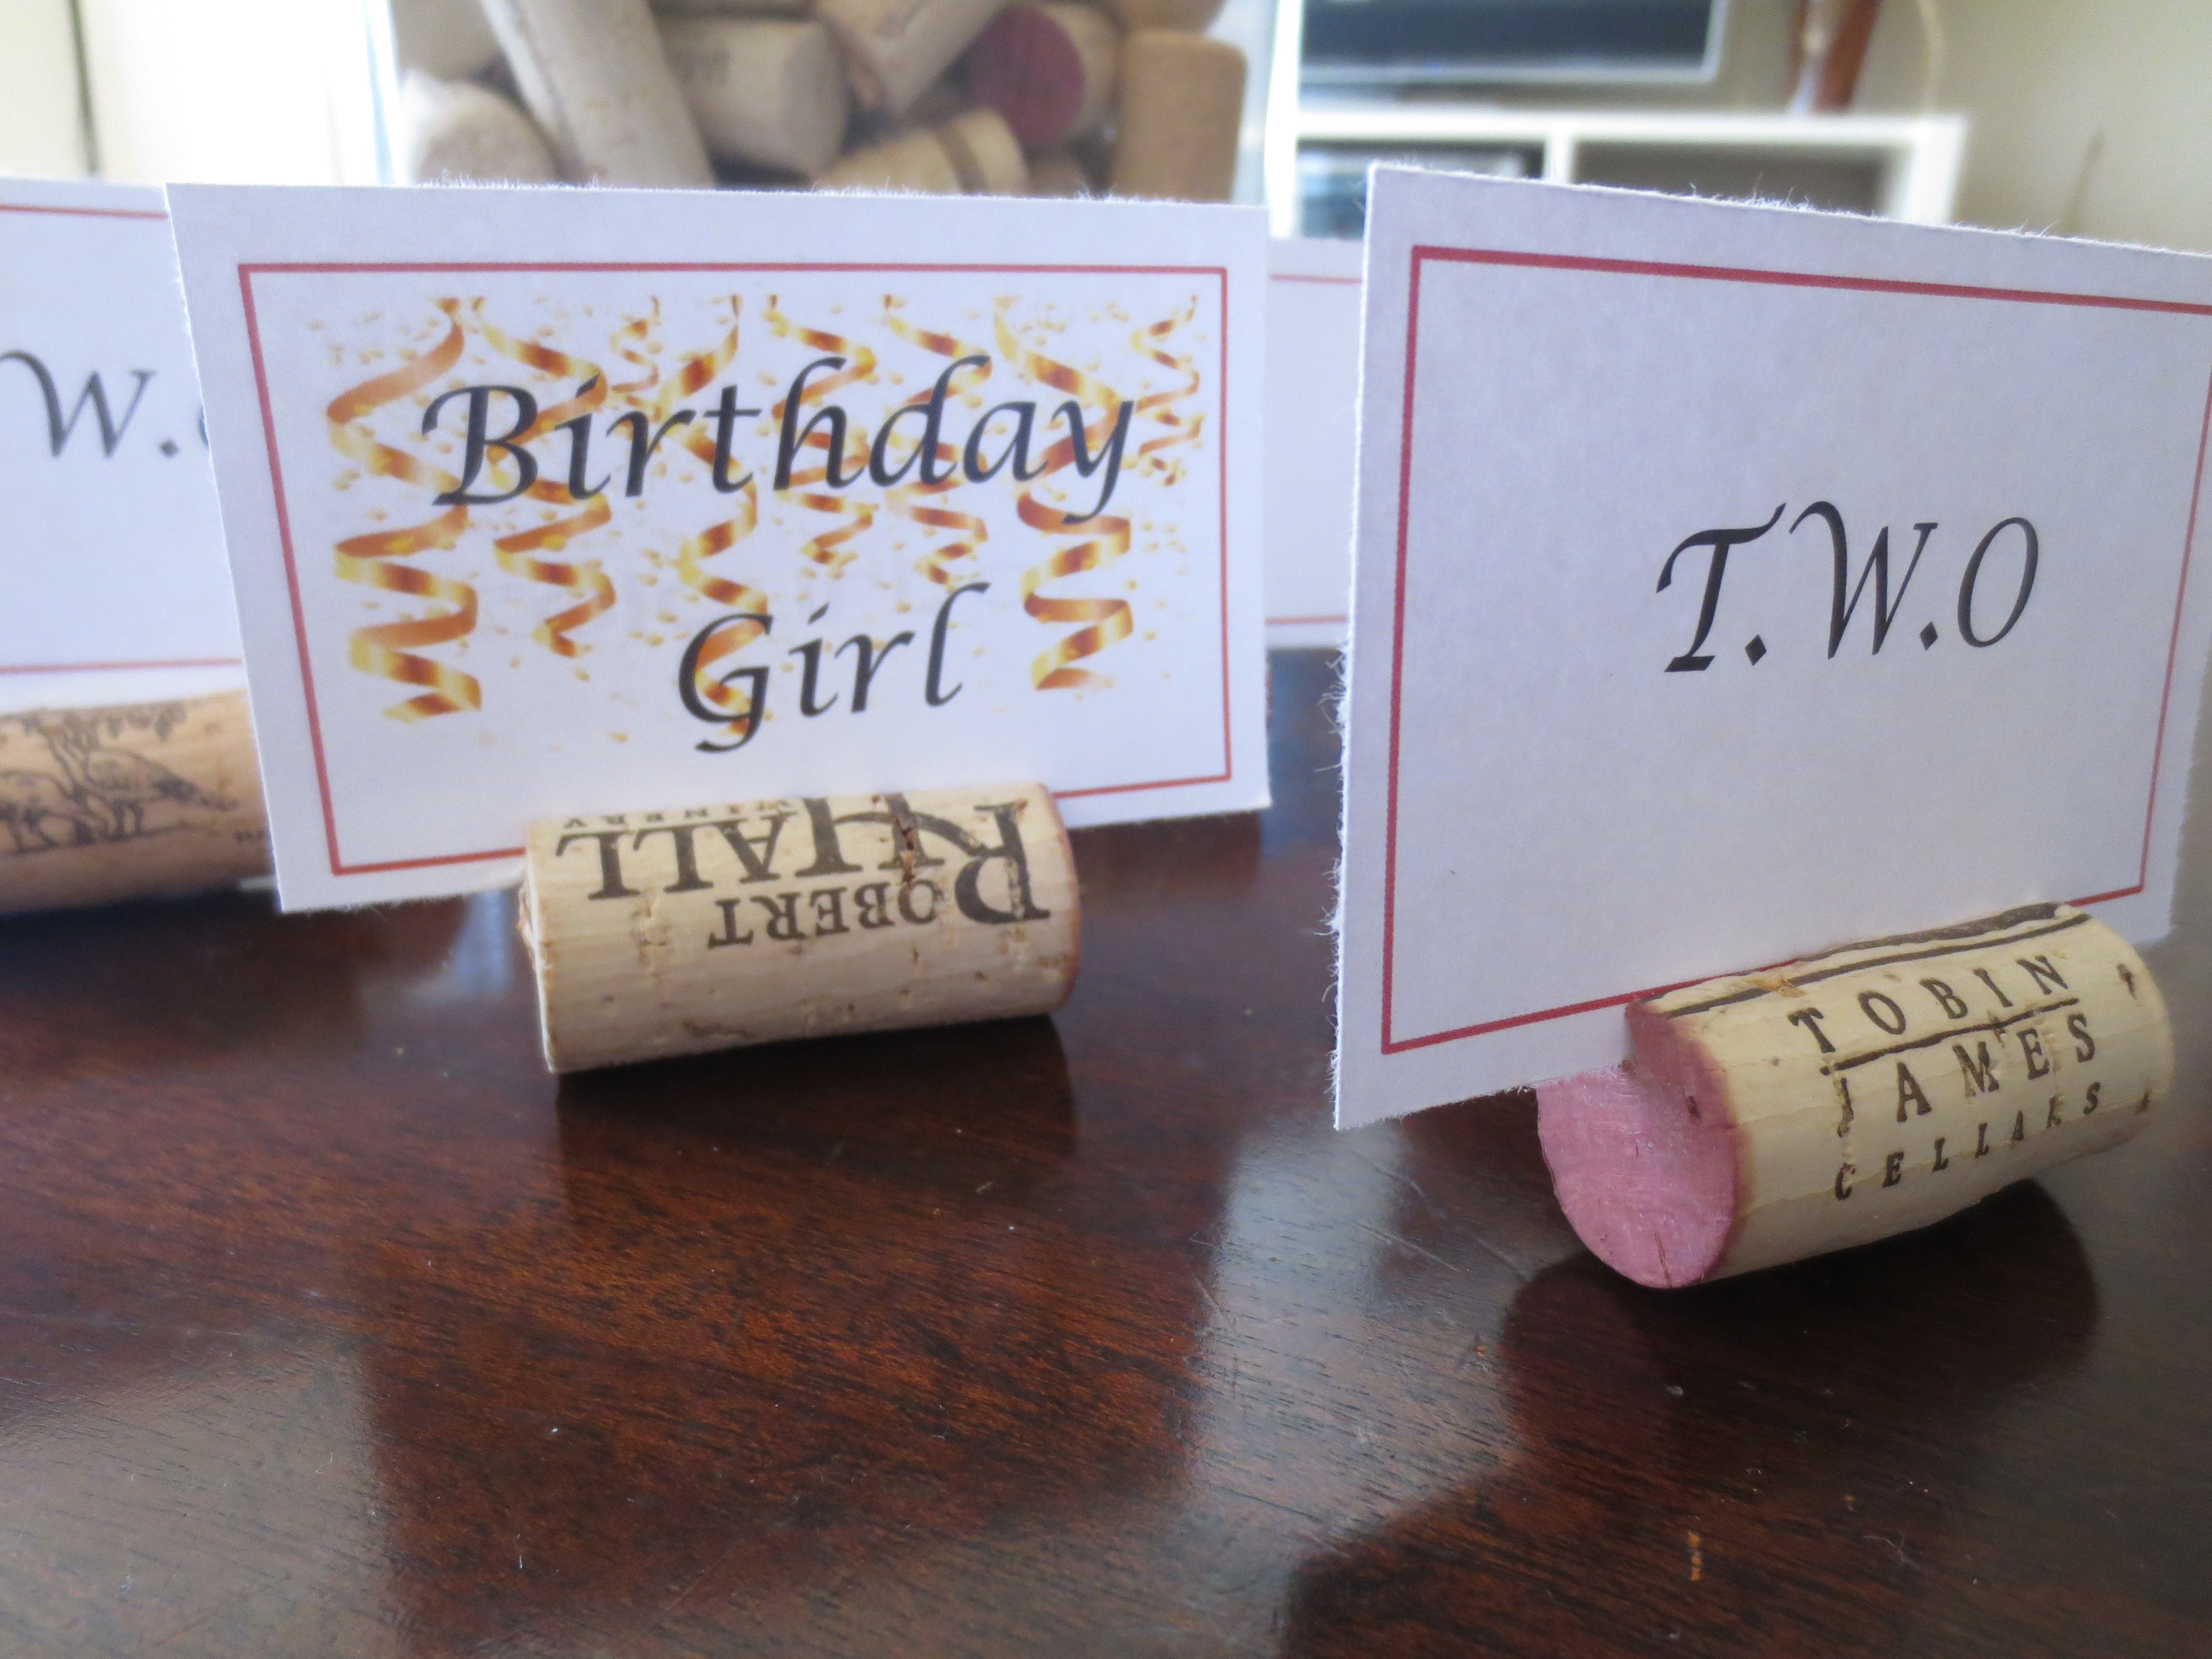 Wine Cork Place Card Holders T W O